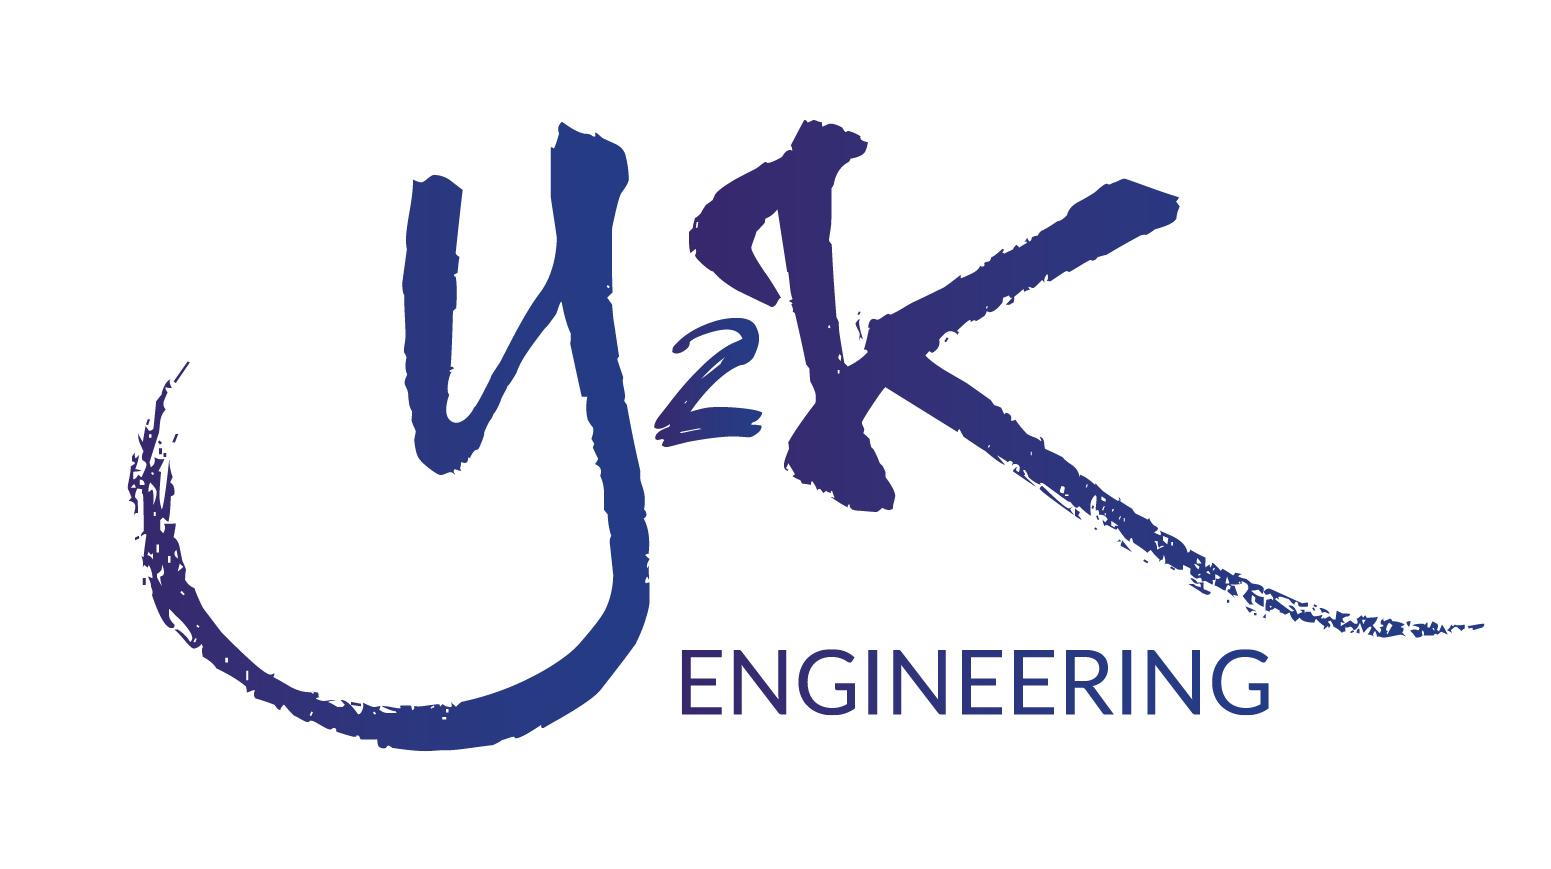 medium resolution of engineering logo